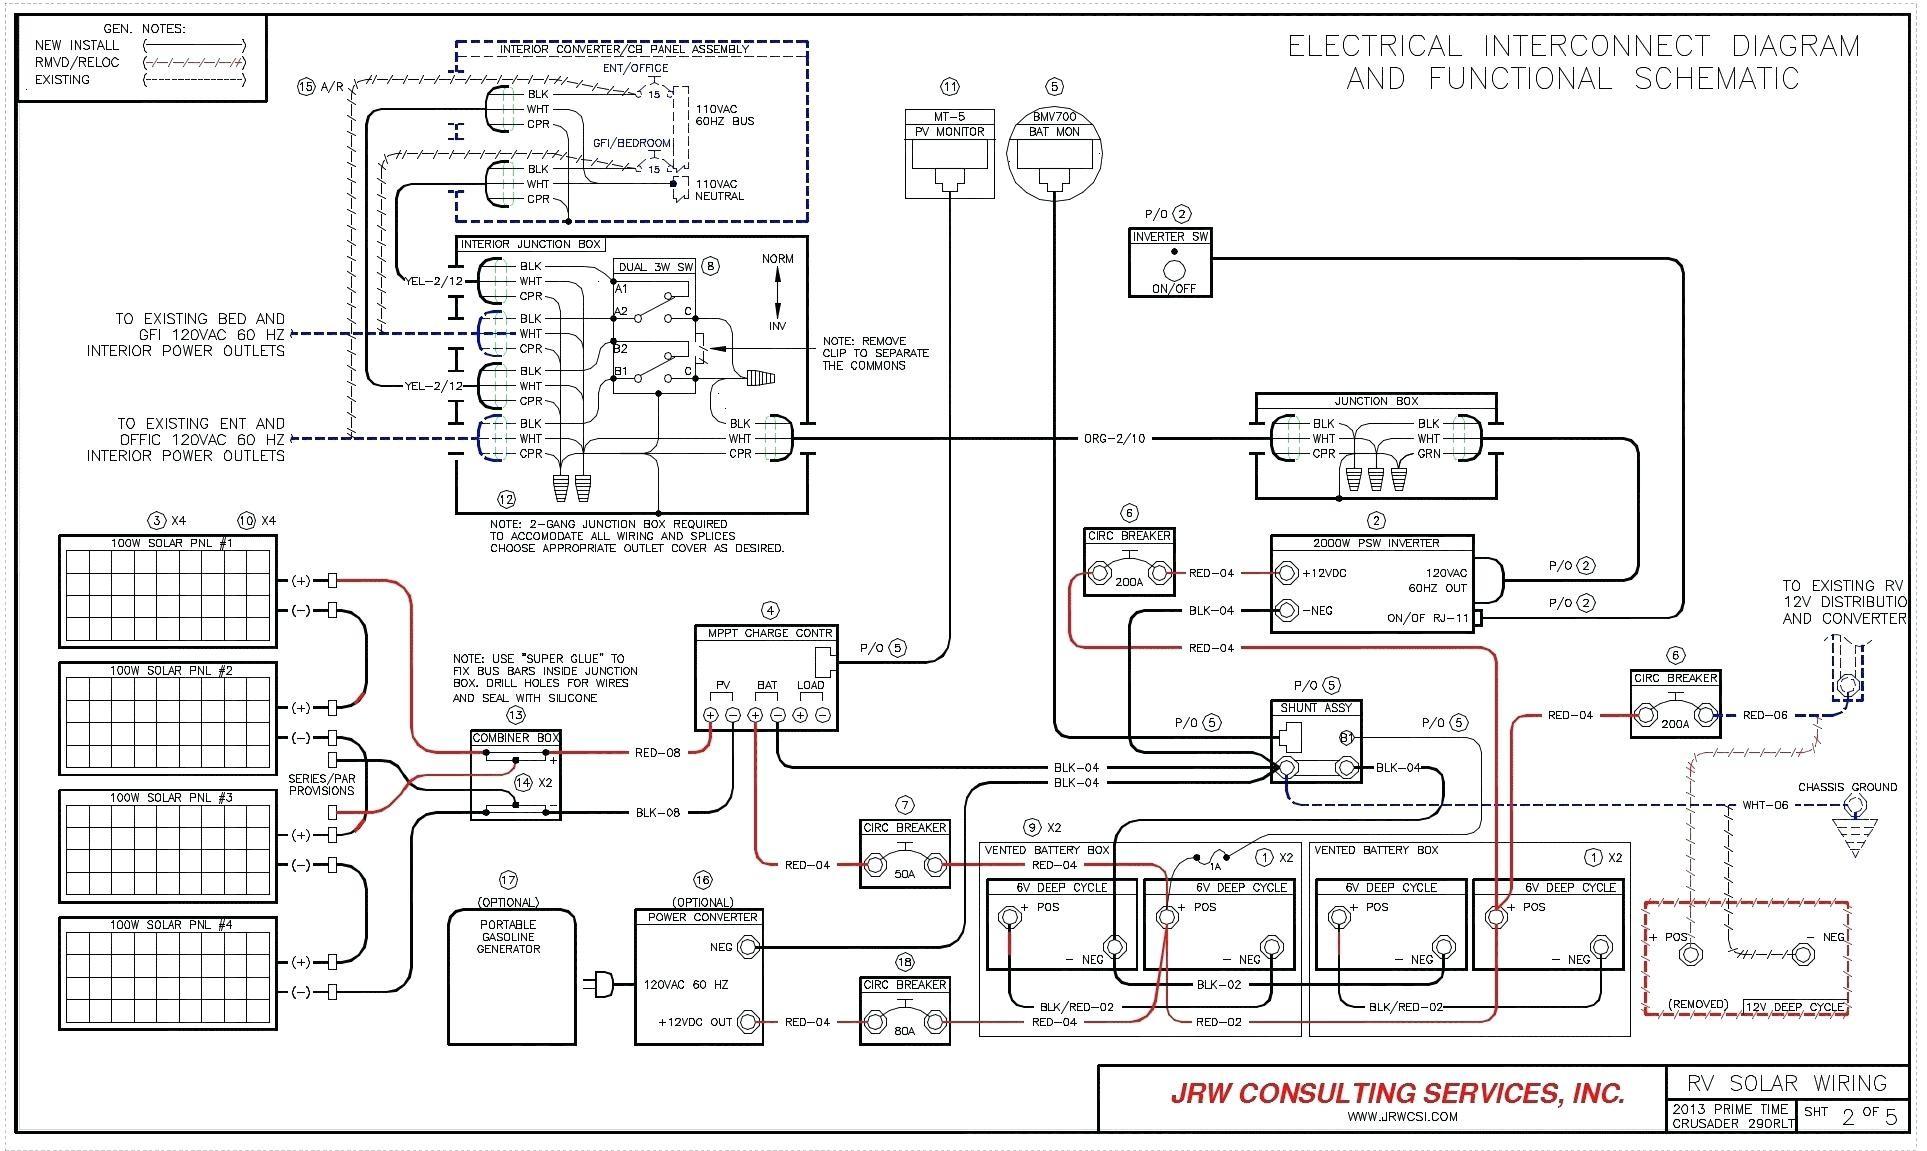 bluebird wiring diagram wiring diagramwrg 4274] bluebird wiring diagrams lightbluebird bus wiring diagram 1994 bluebird circuit diagrams data rh